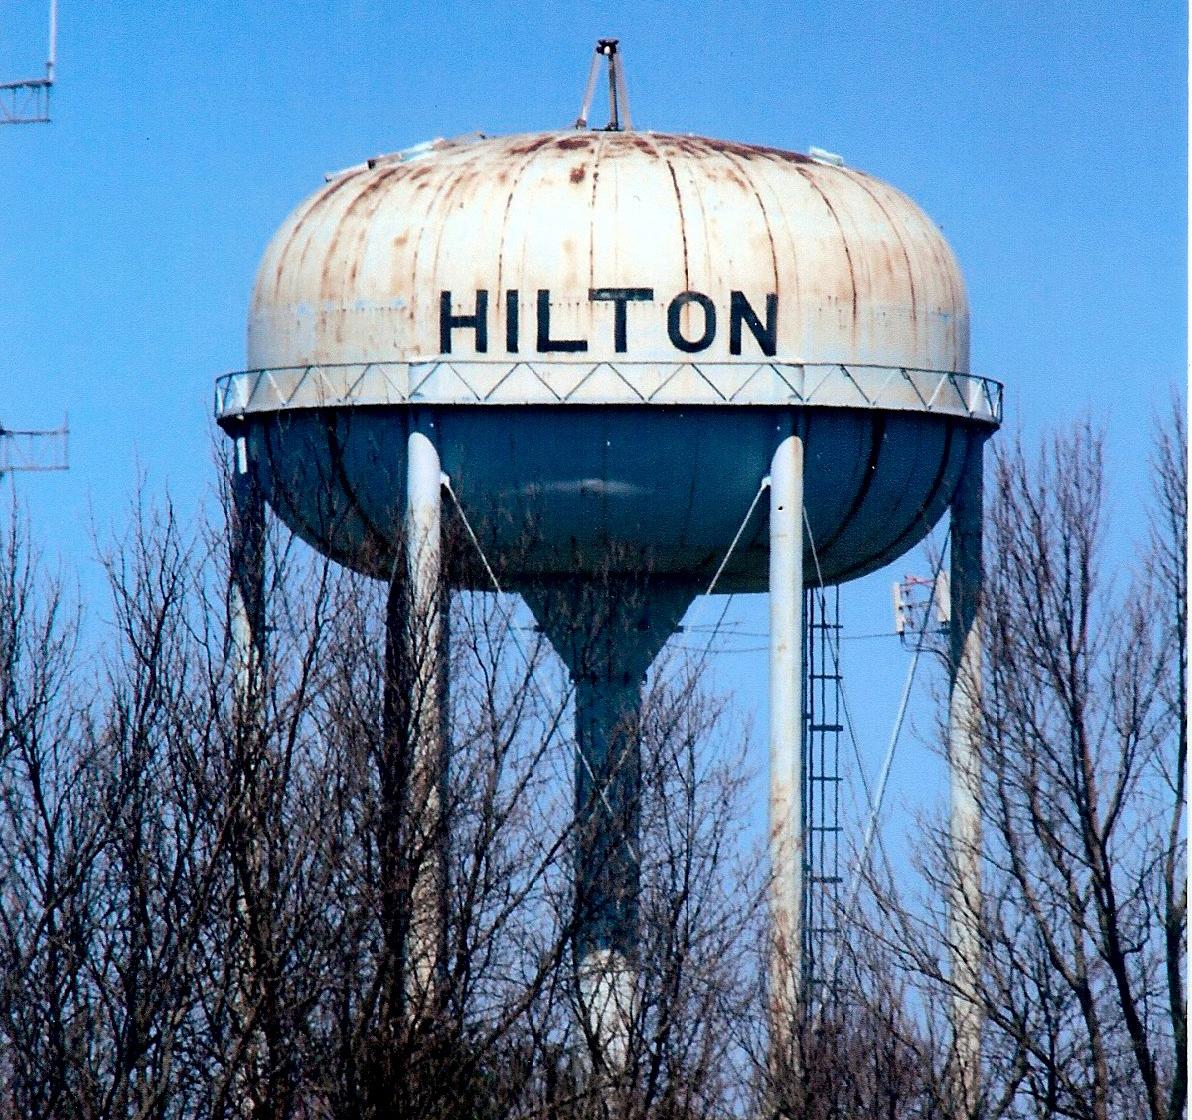 New york monroe county hilton - April 14 2016 The Hilton Water Tower Sans Antennae Awaits A Cover So